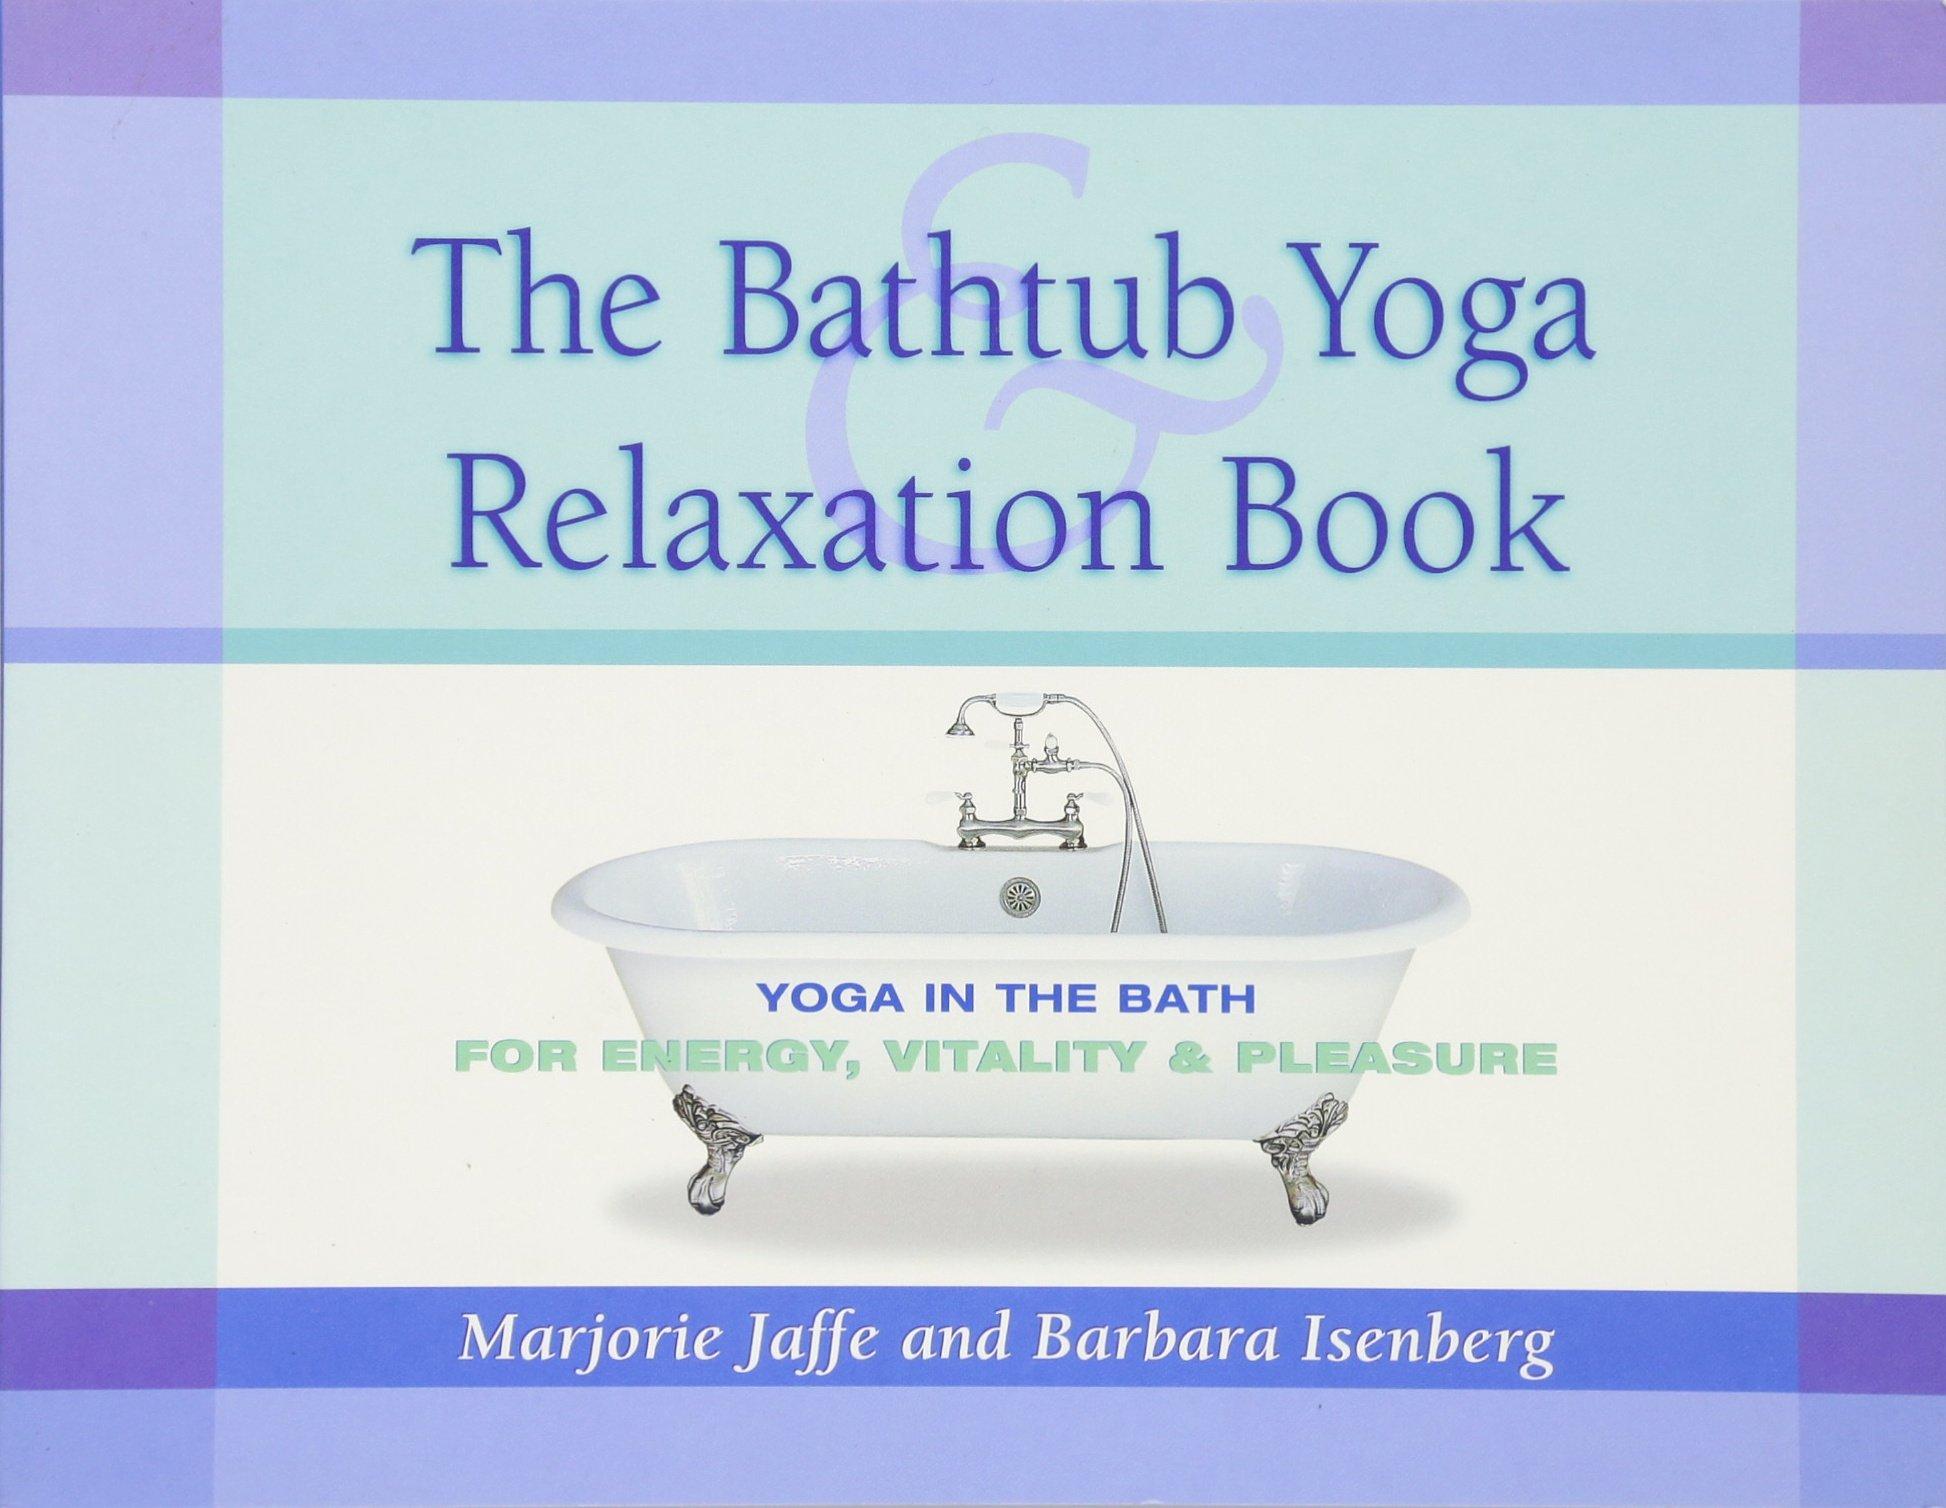 The Bathtub Yoga & Relaxation Book: Yoga in the Bath for Energy ...